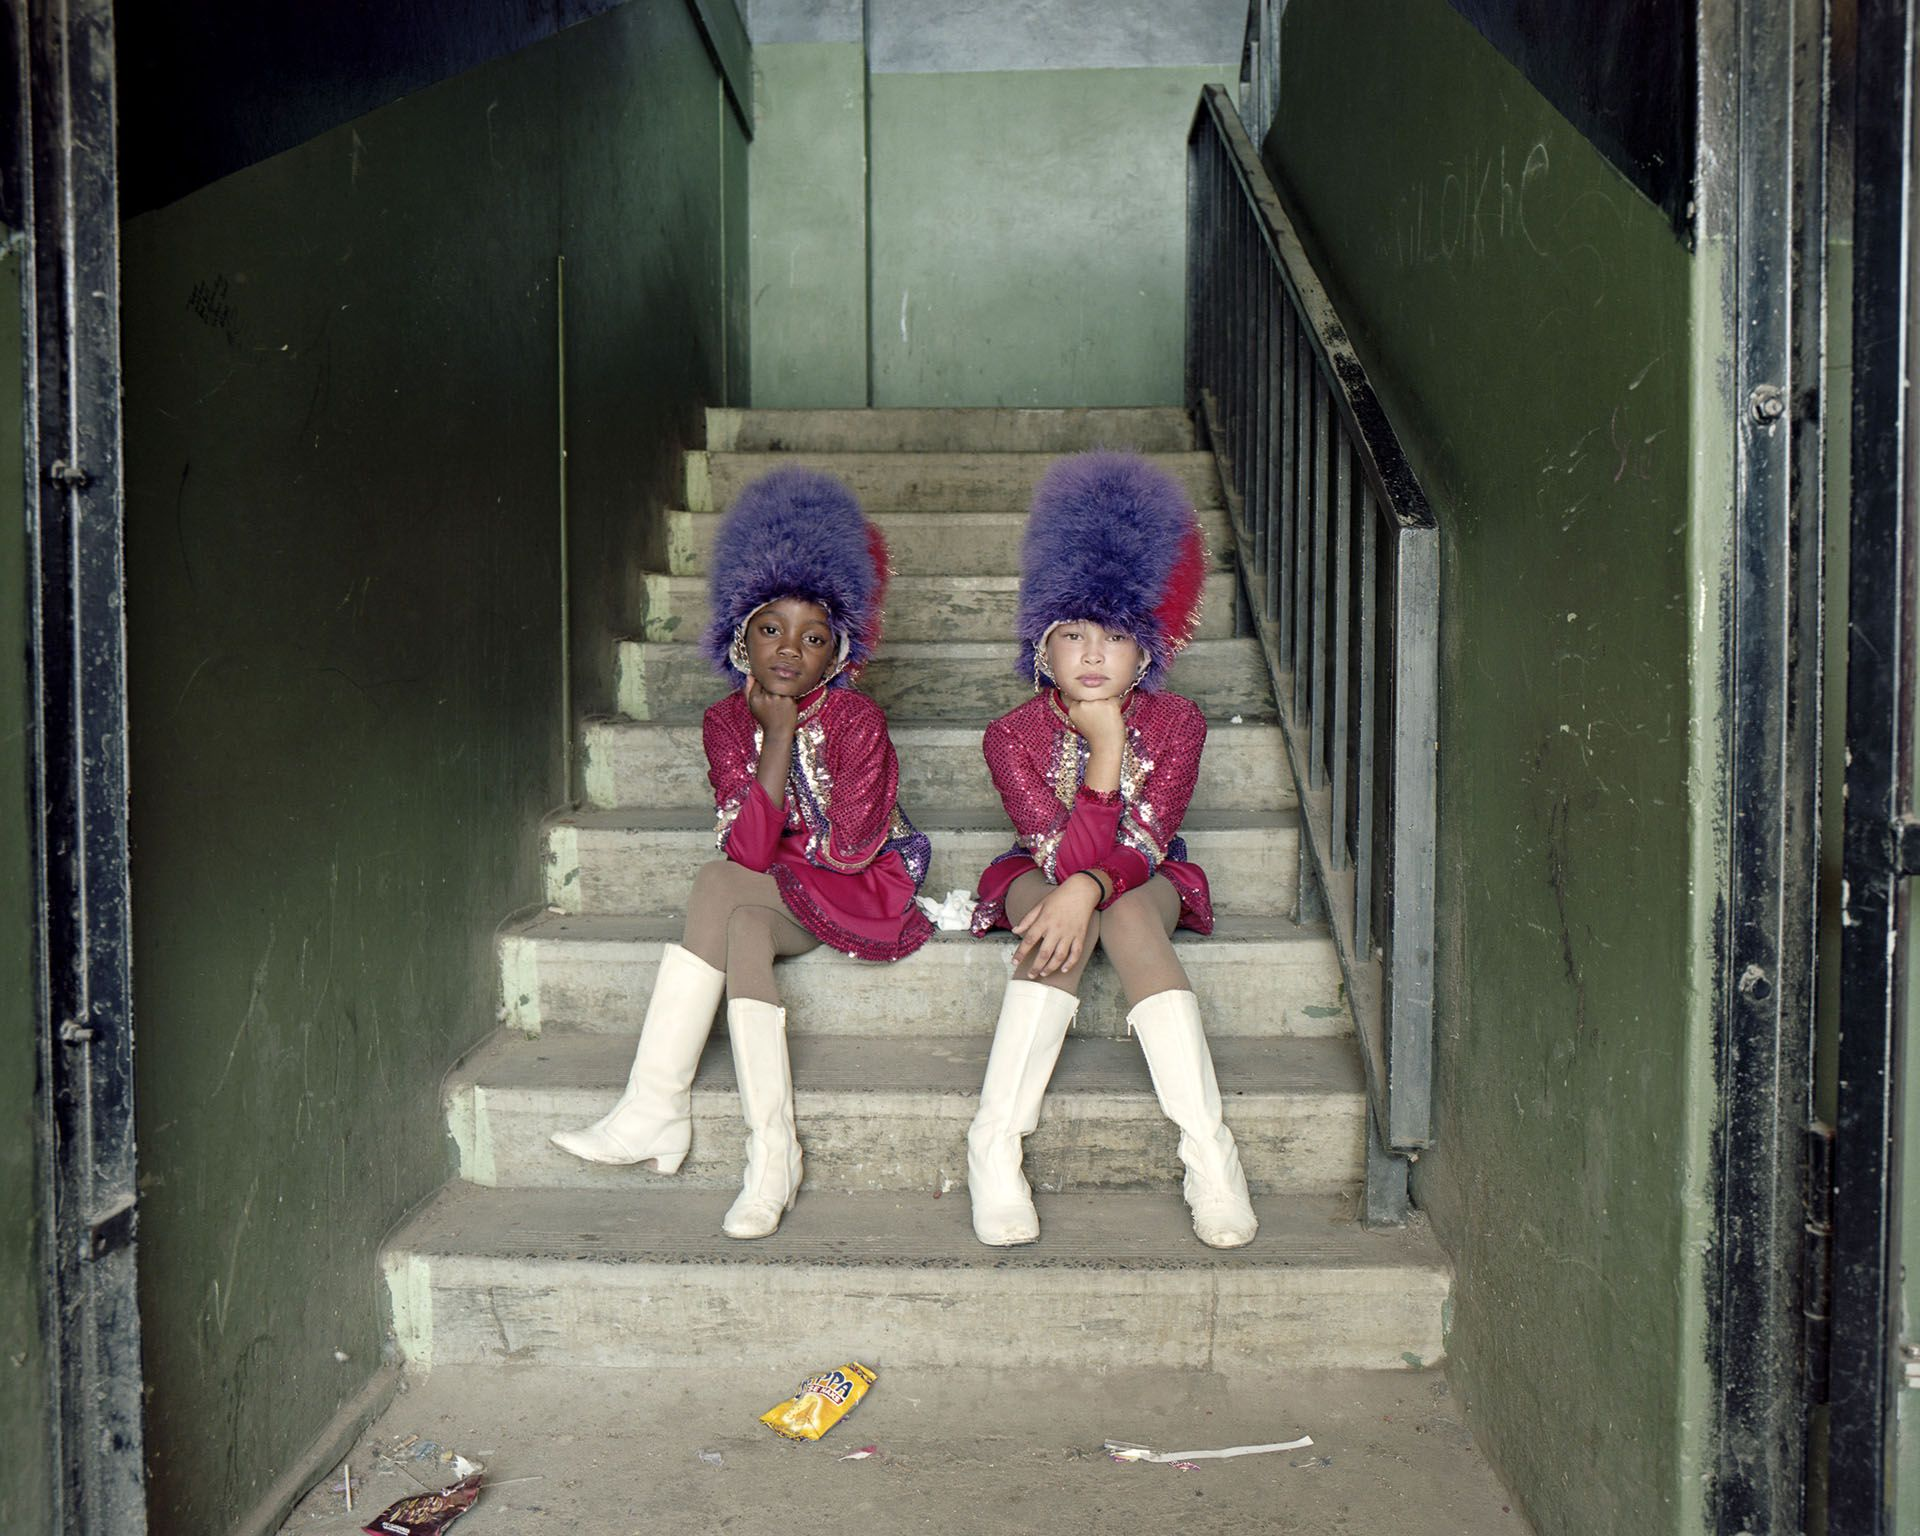 Alice Mann photographie Drumies